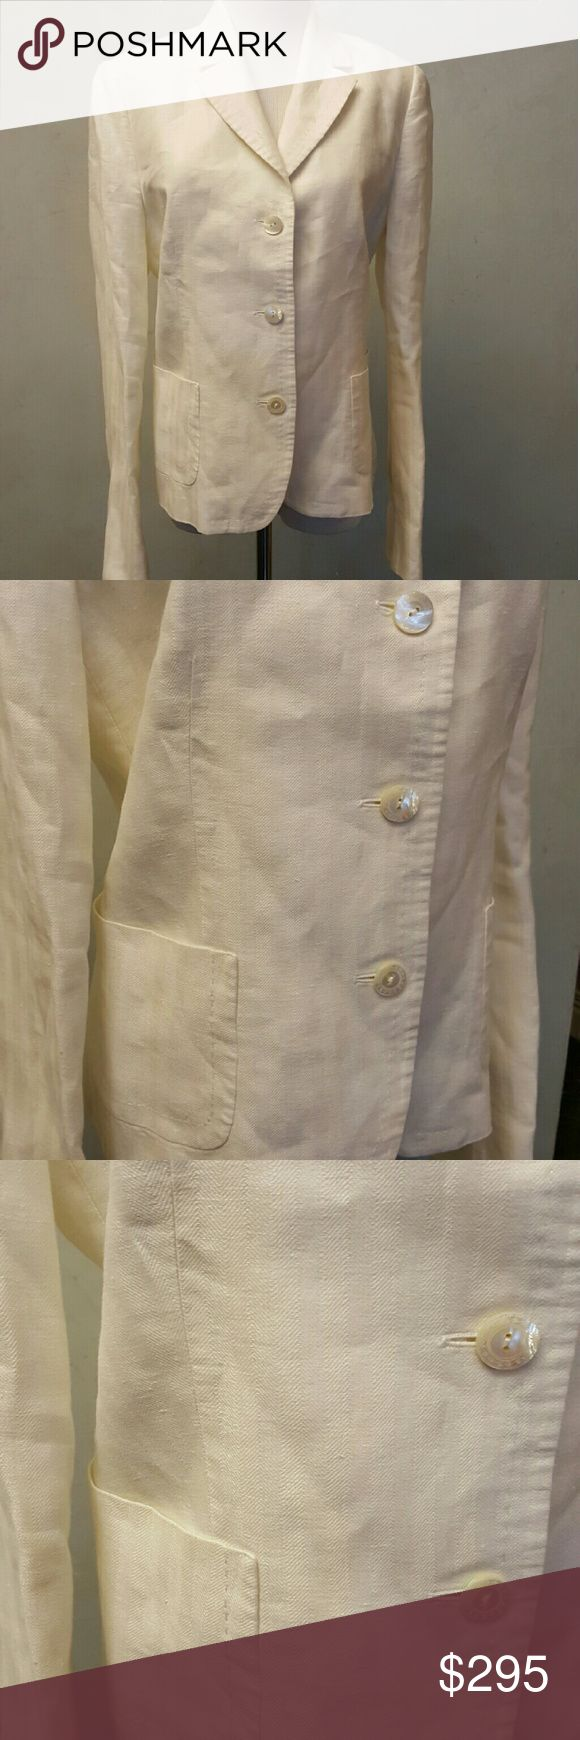 Faconnable cream linen blazer Faconnable cream linen blazer in great condition.  2 pockets. Faconnable Jackets & Coats Blazers